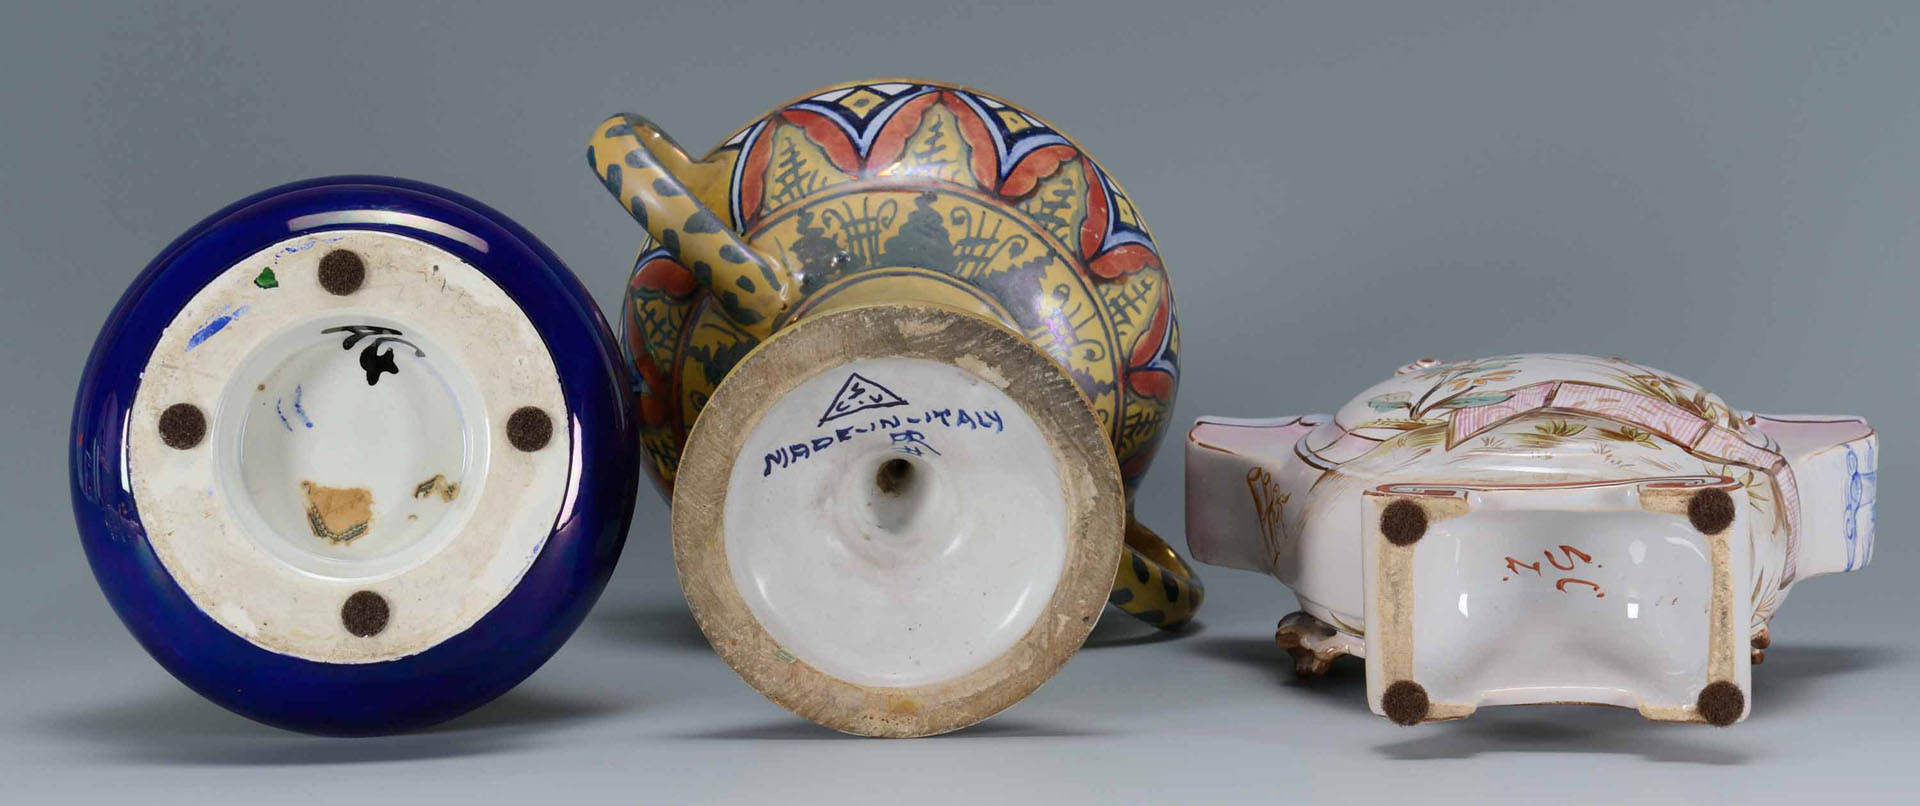 3 Italian Vases & Prattware Plate, 4 pcs.